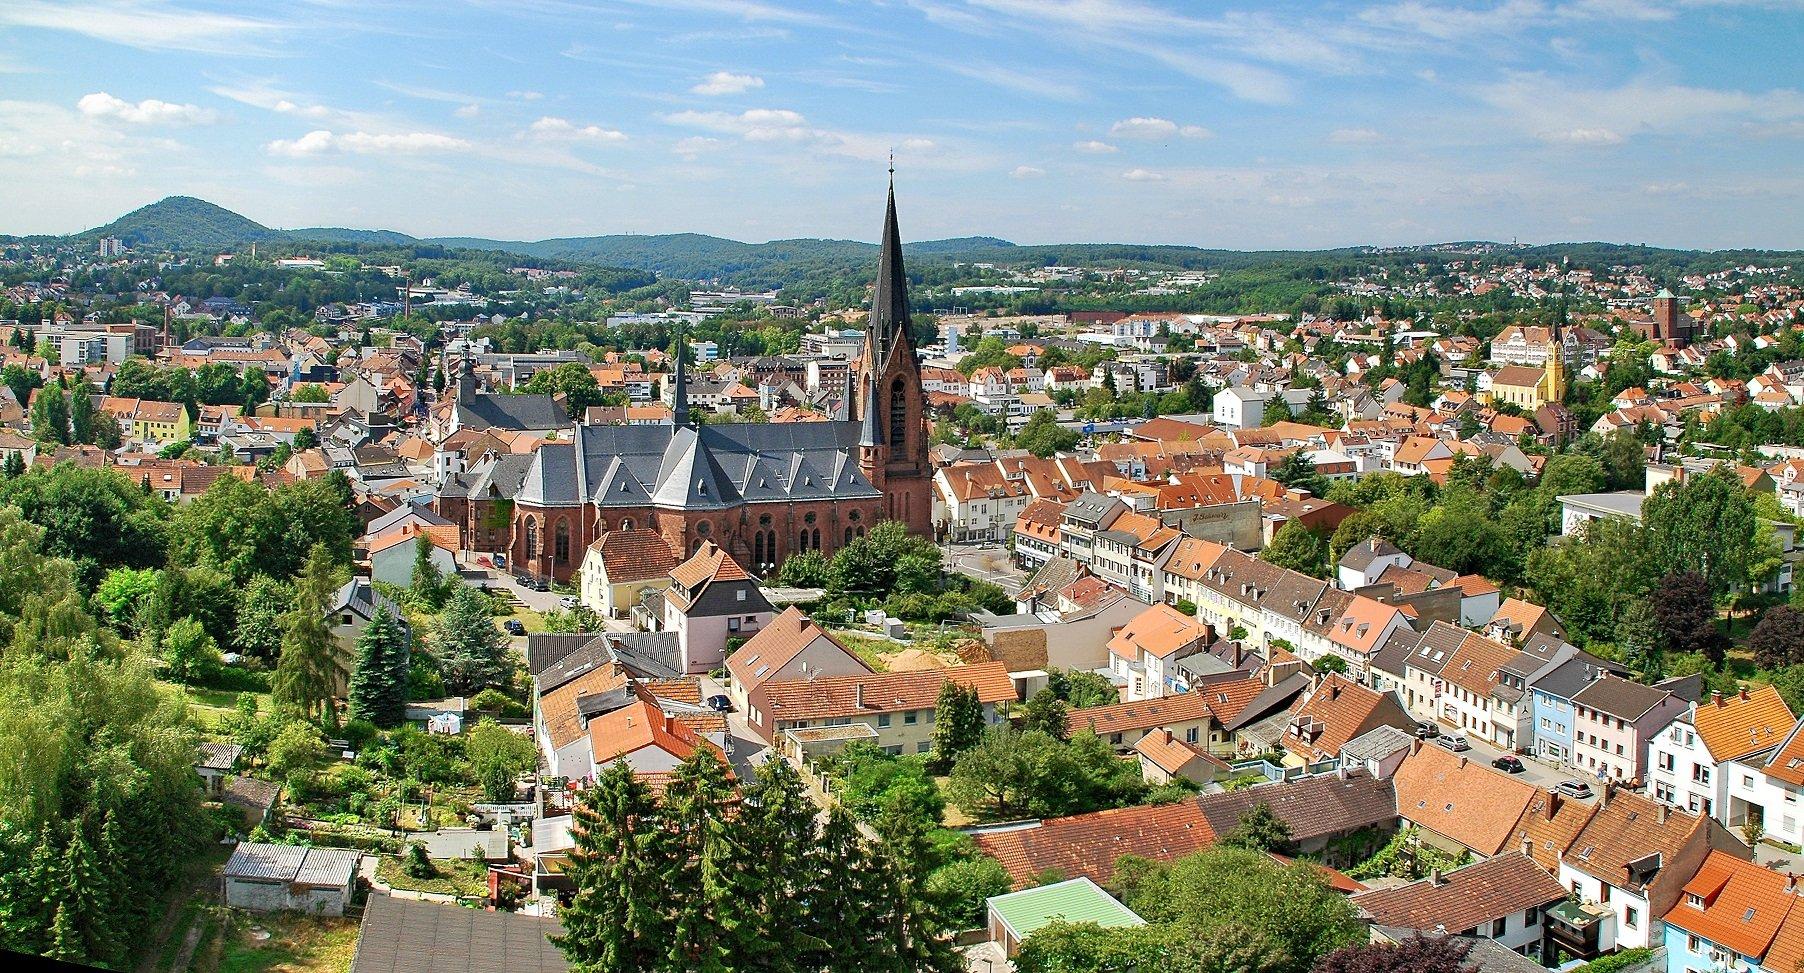 Blick auf St. Ingbert